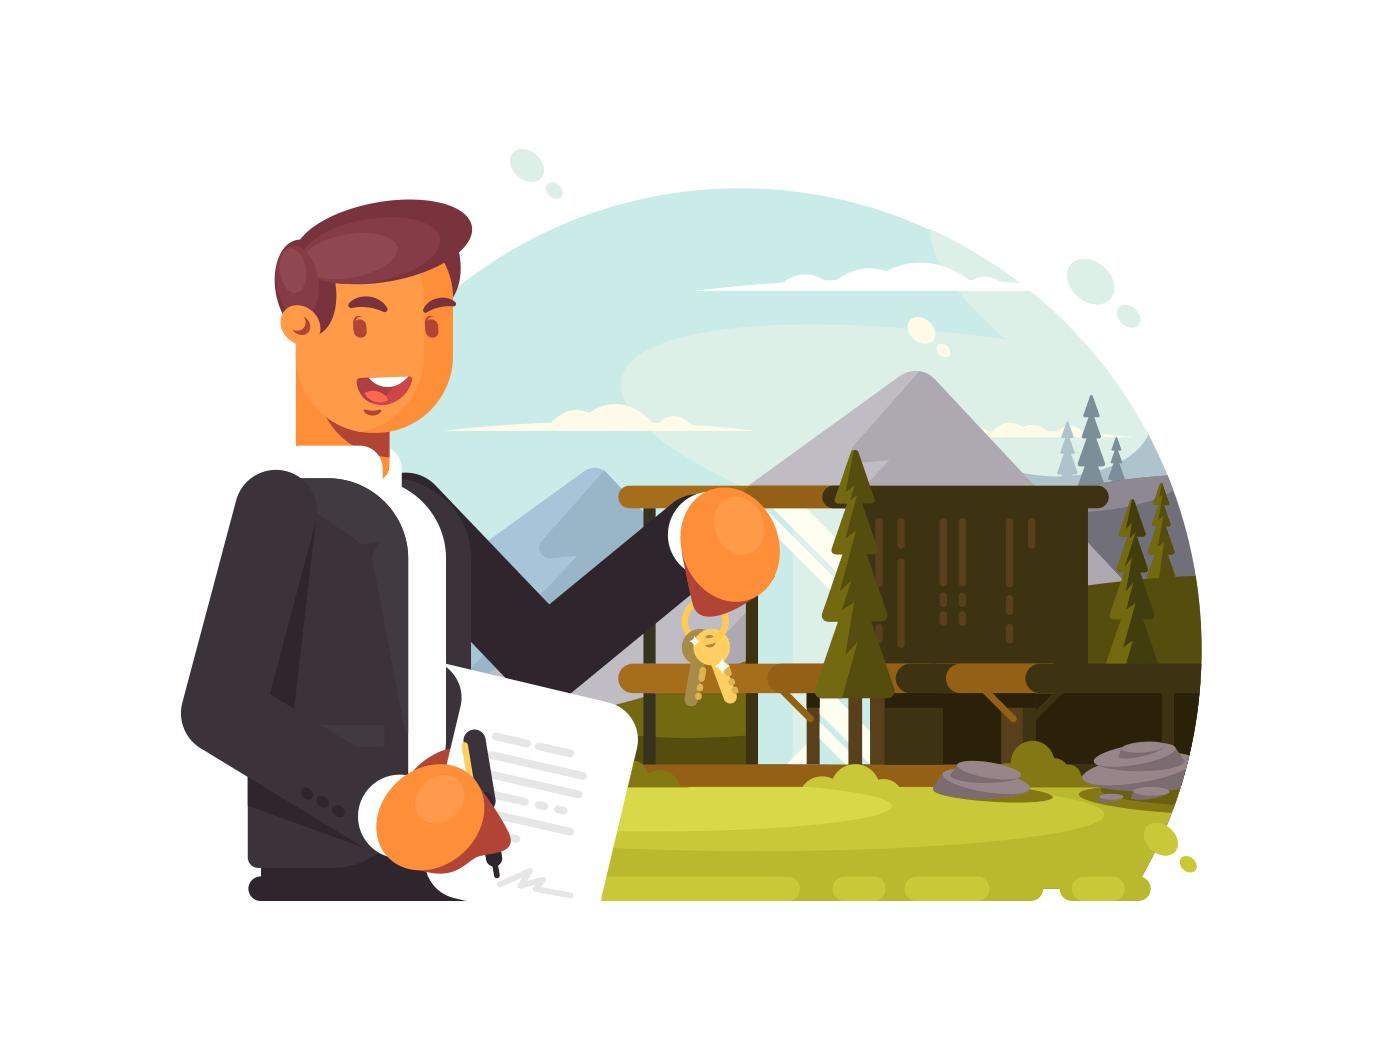 Successful realtor sells property illustration